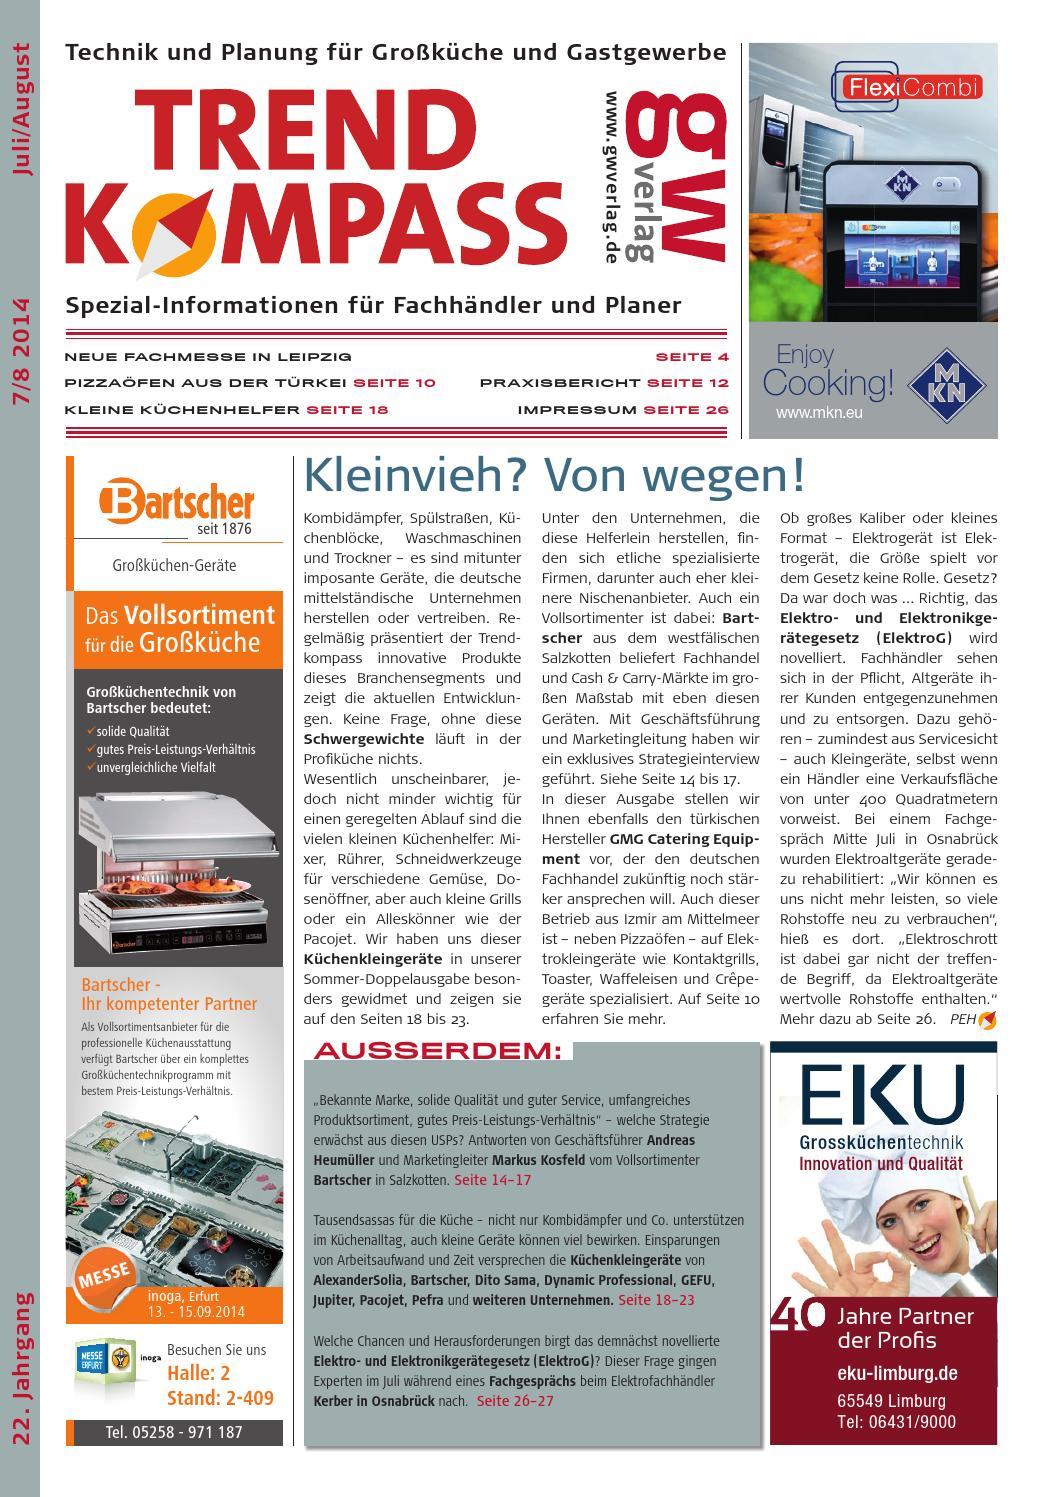 Trendkompass 7.8/14 By GW VERLAG   Issuu